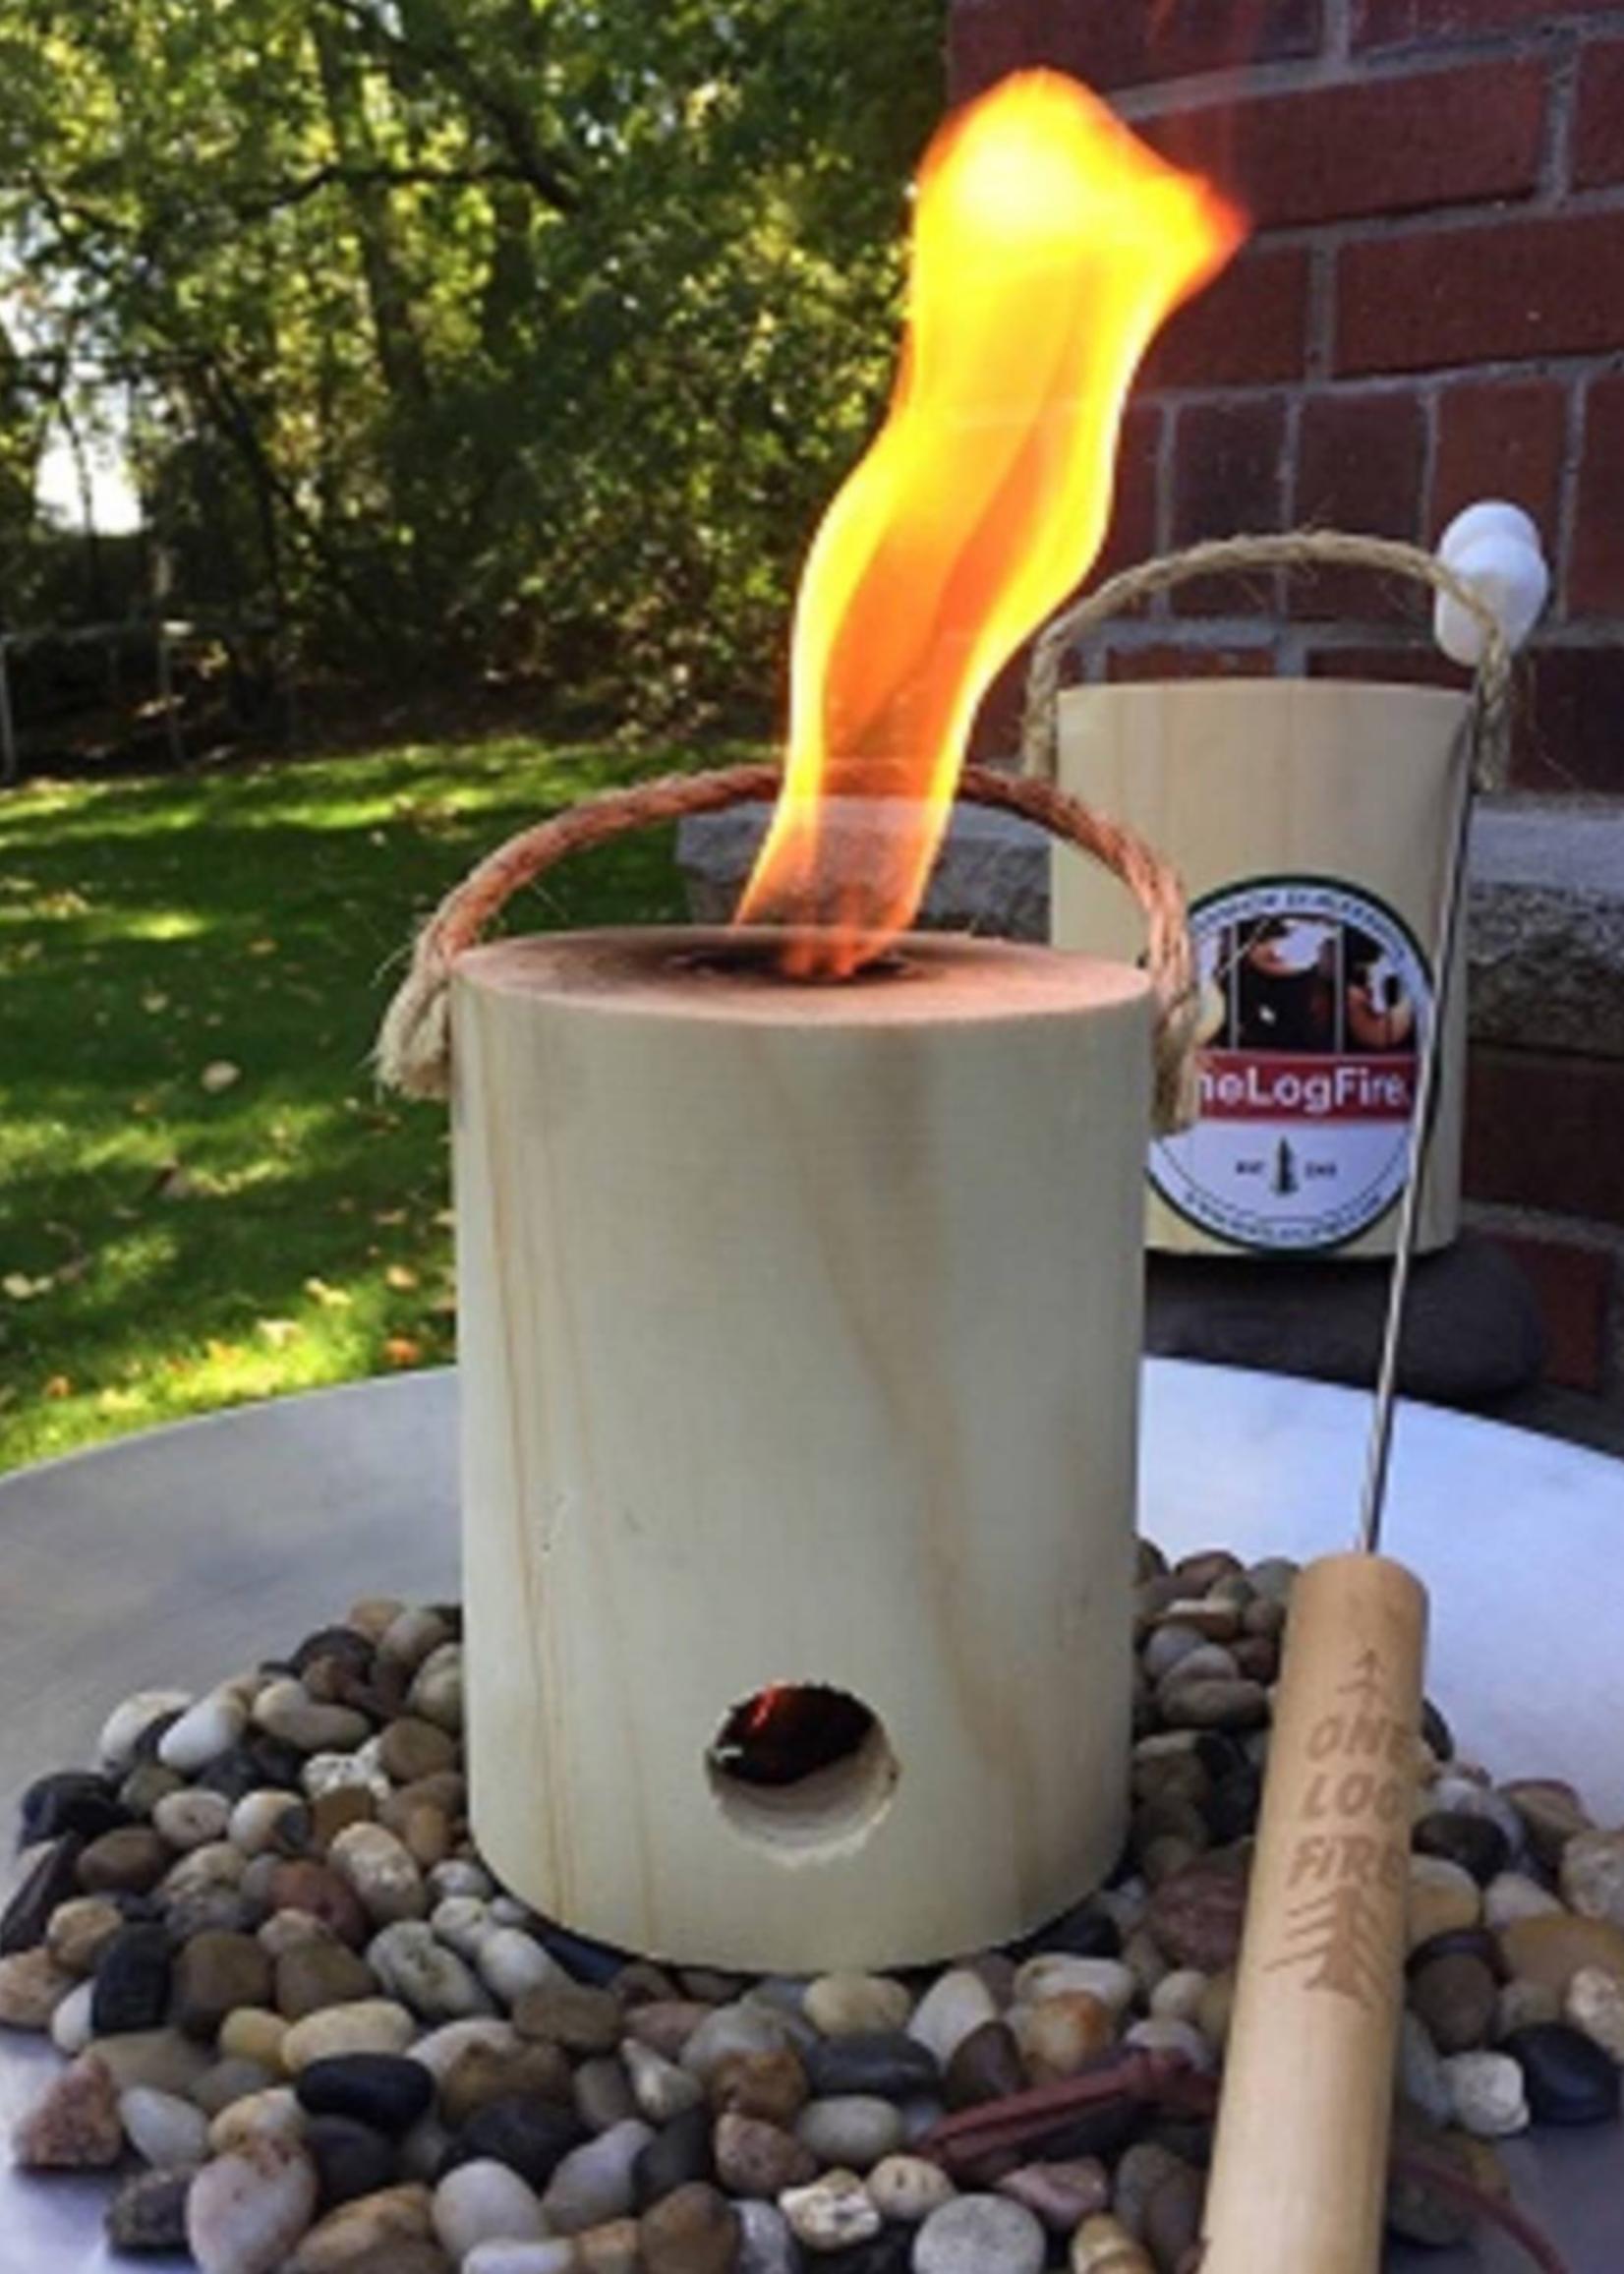 Mini Logfire